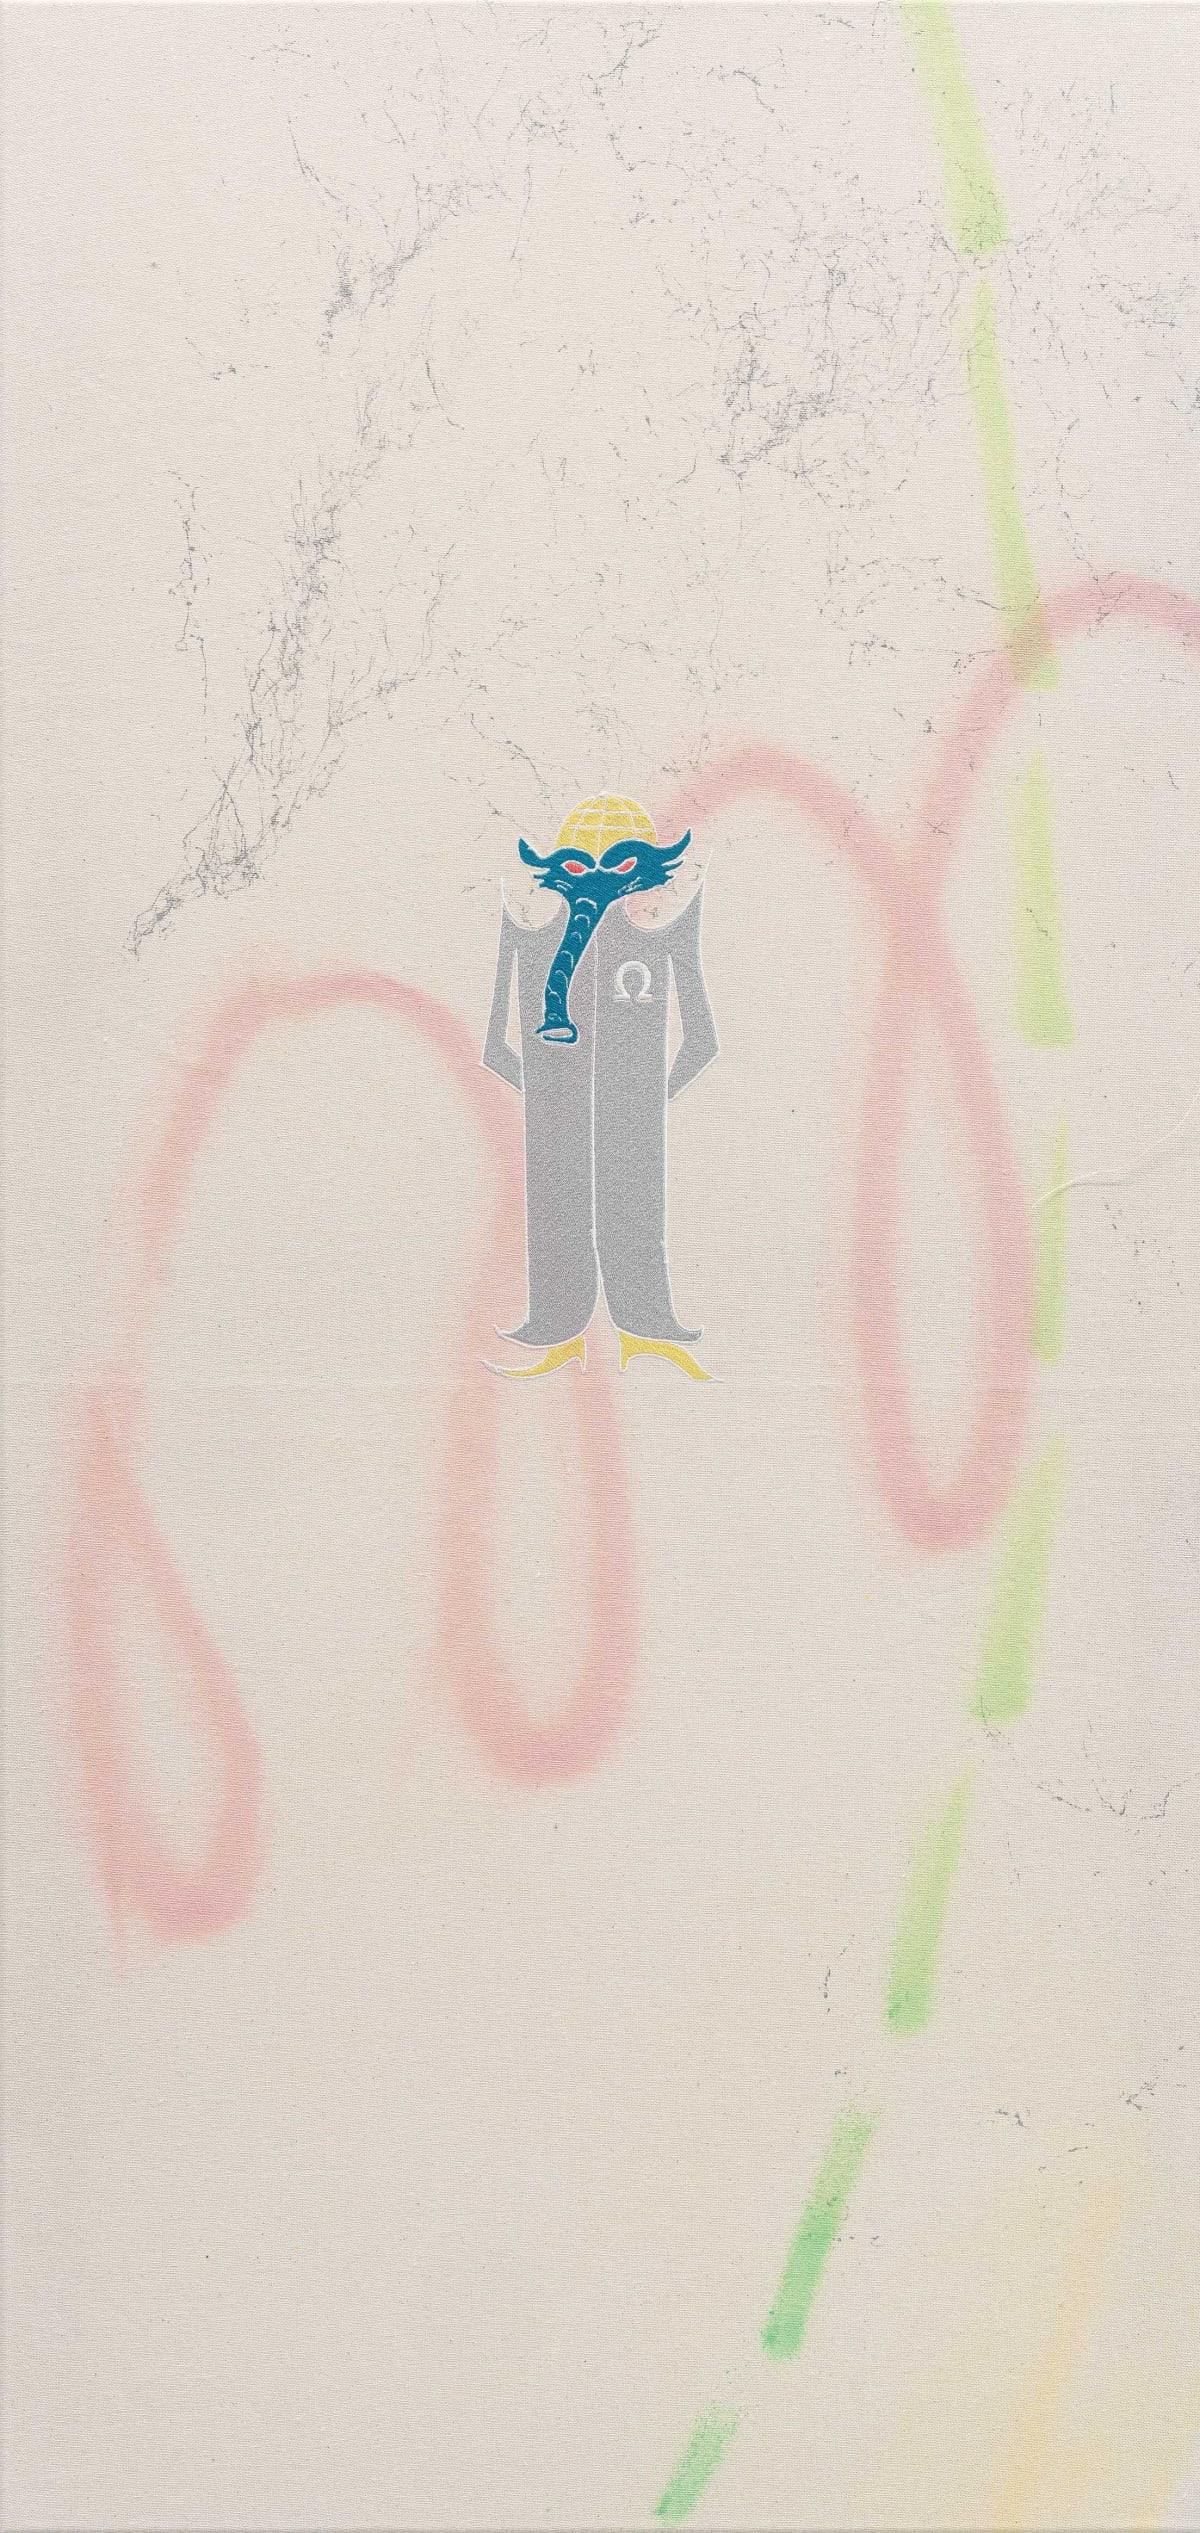 Niko Abramidis & NE Omega Anteater Scientist, 2019 canvas, spraypaint, embroidery 125 x 60 x 4 cm 49 1/4 x...